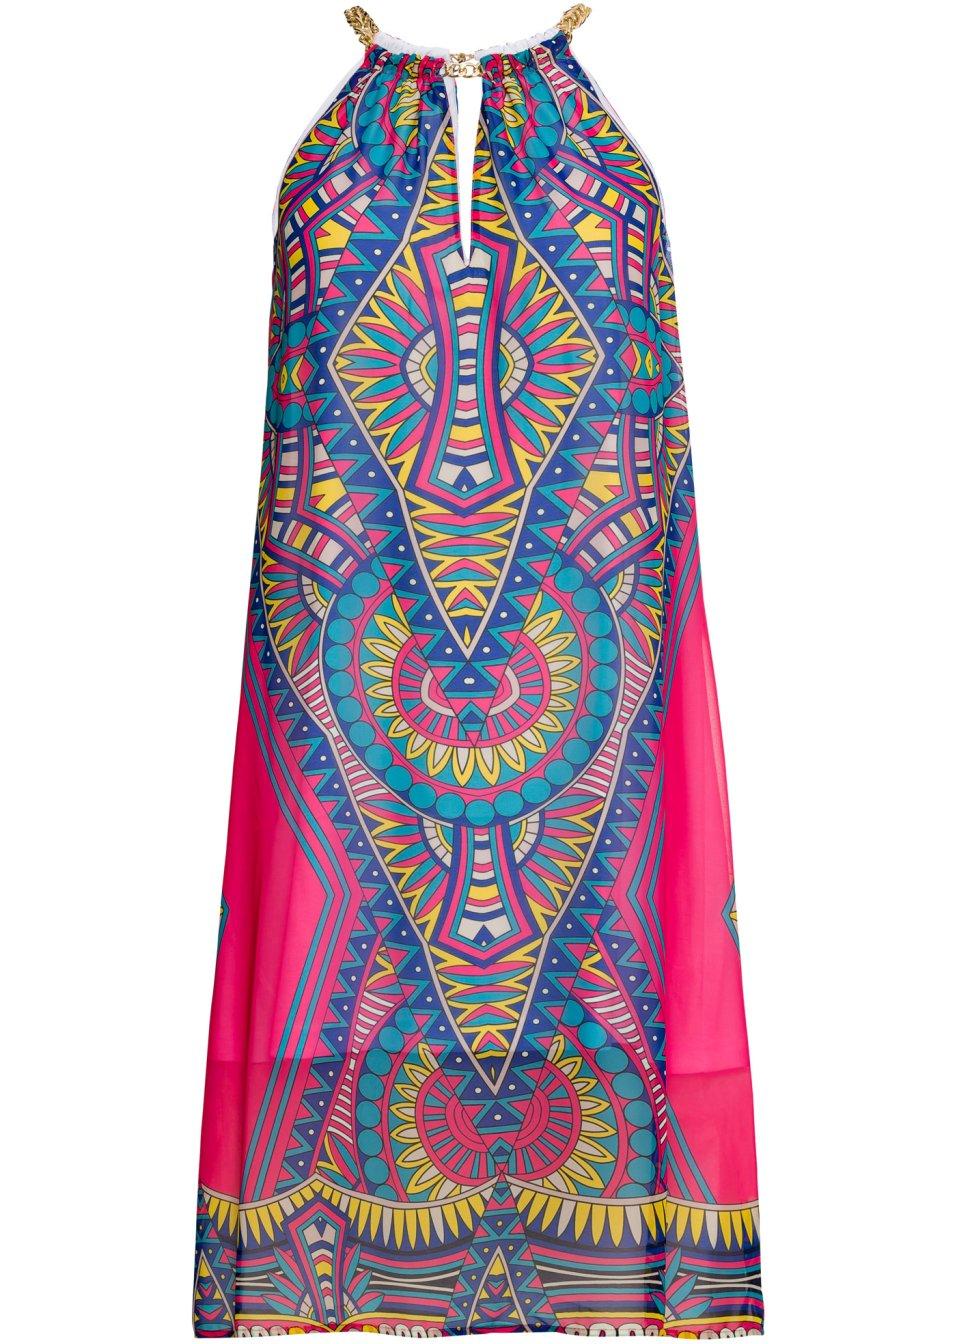 Ausgefallenes Kleid mit Cut-Out - pink gemustert wFoLU XEJLb